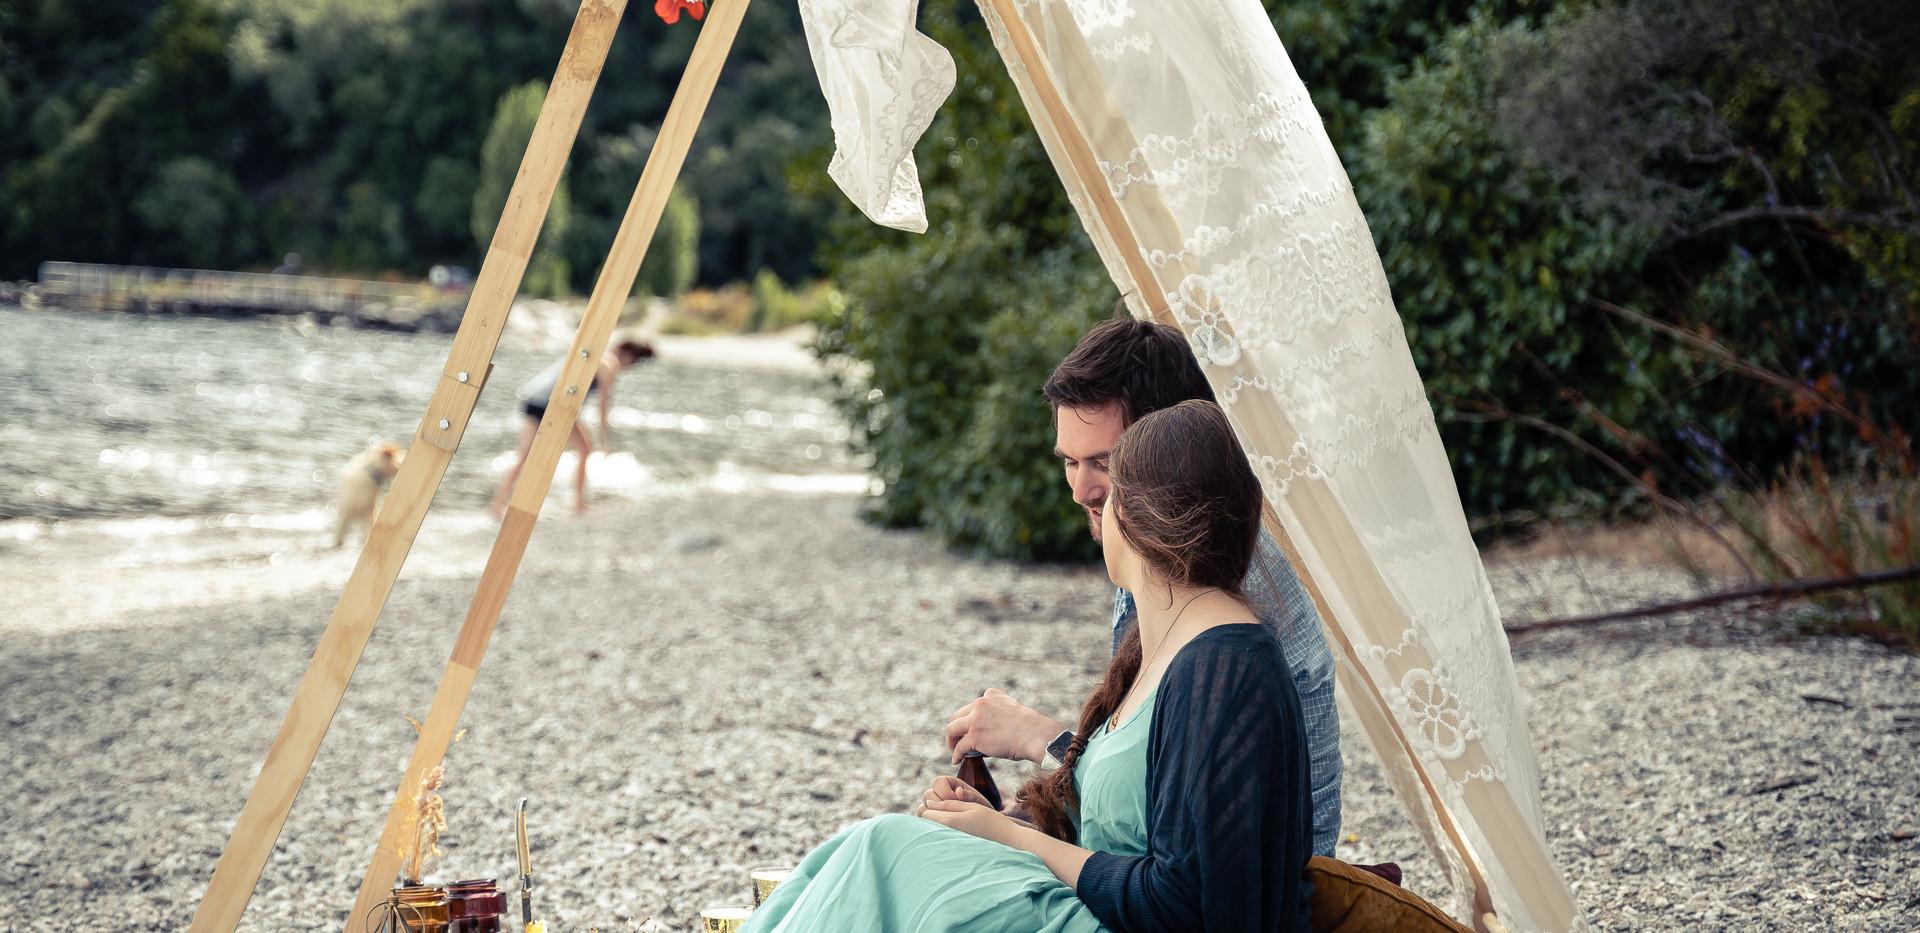 Glamping Romantic Picnic